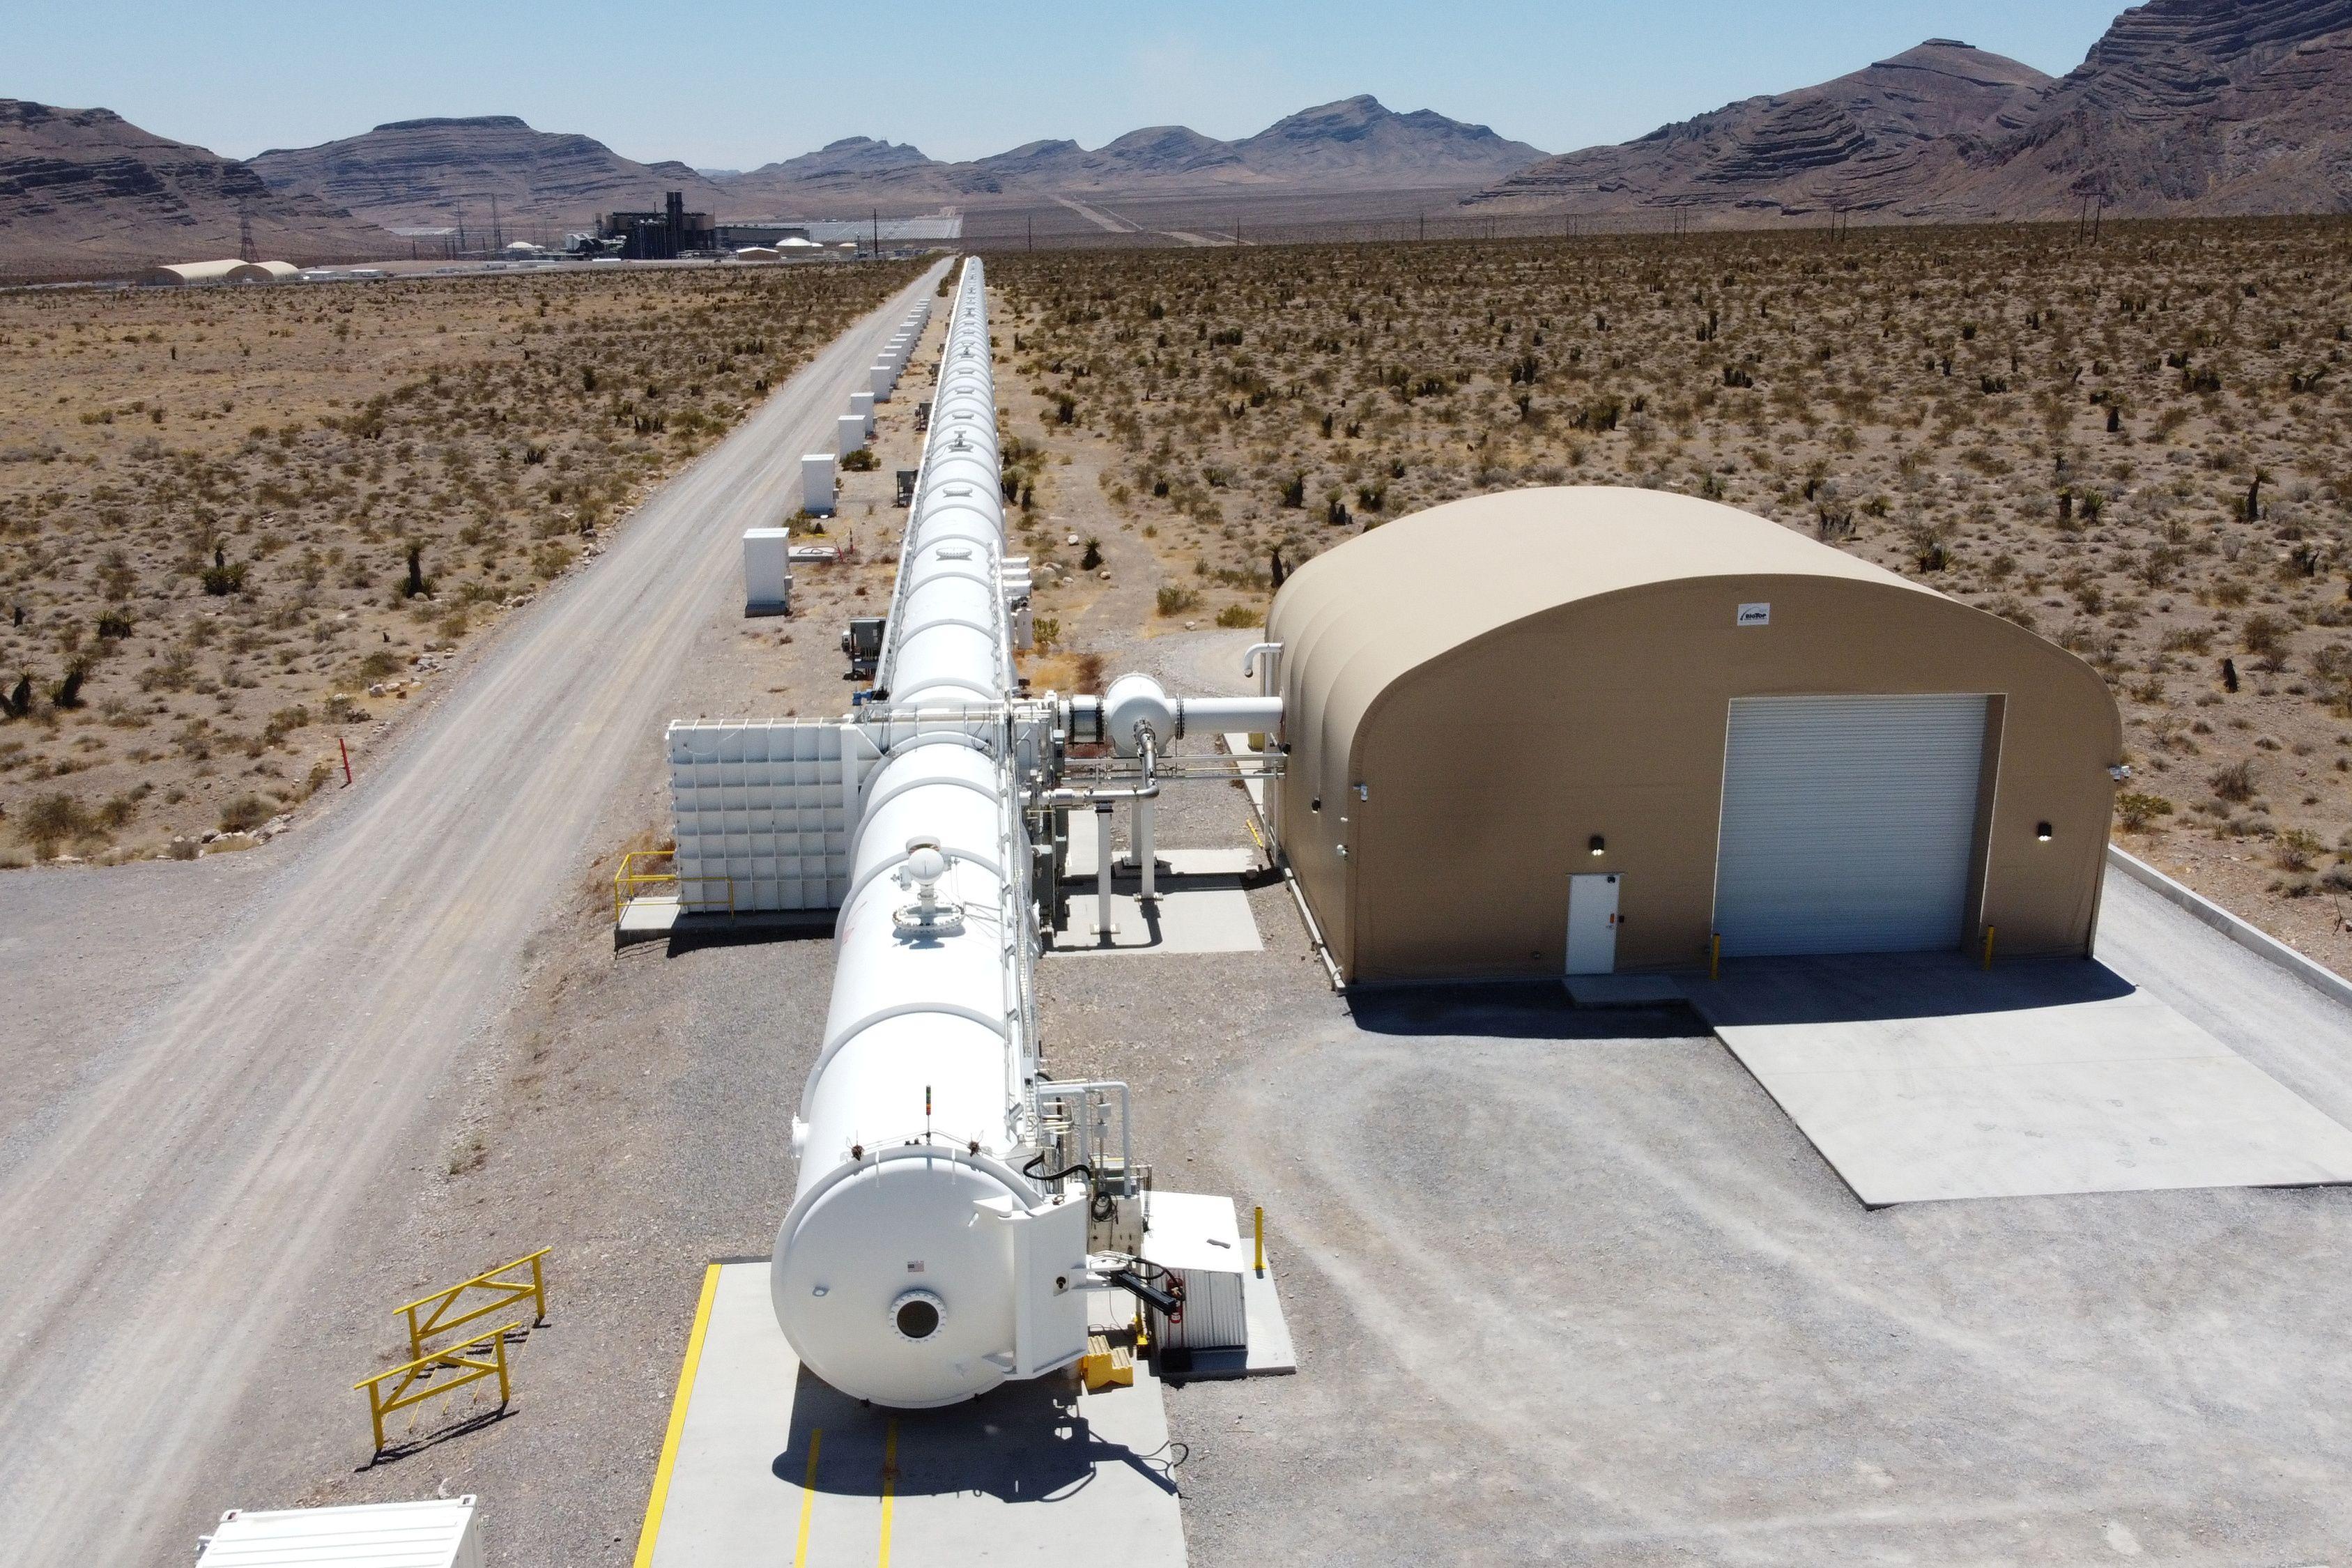 A test hyperloop tube is seen at the Virgin Hyperloop facility near Las Vegas, Nevada, May 5, 2021. REUTERS/Mike Blake